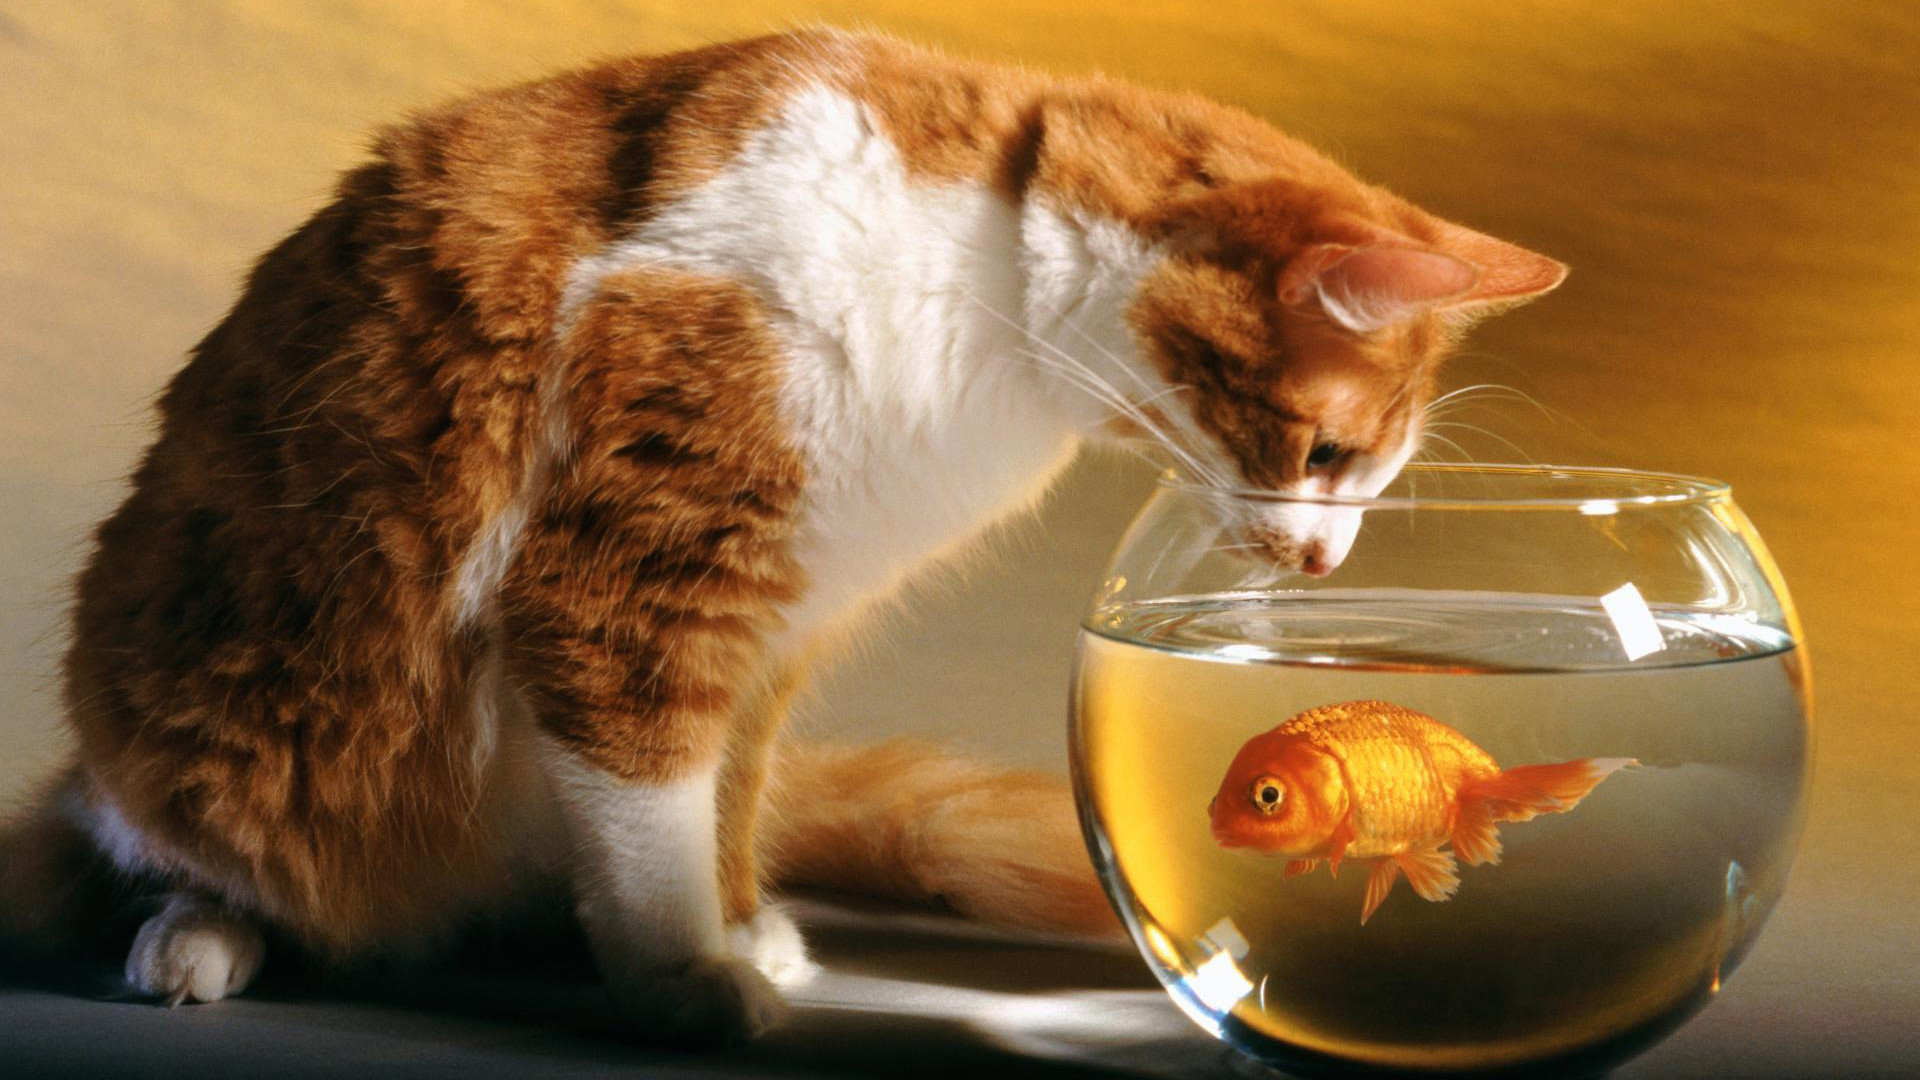 fish tank wallpaper hd for desktop full screen flower download